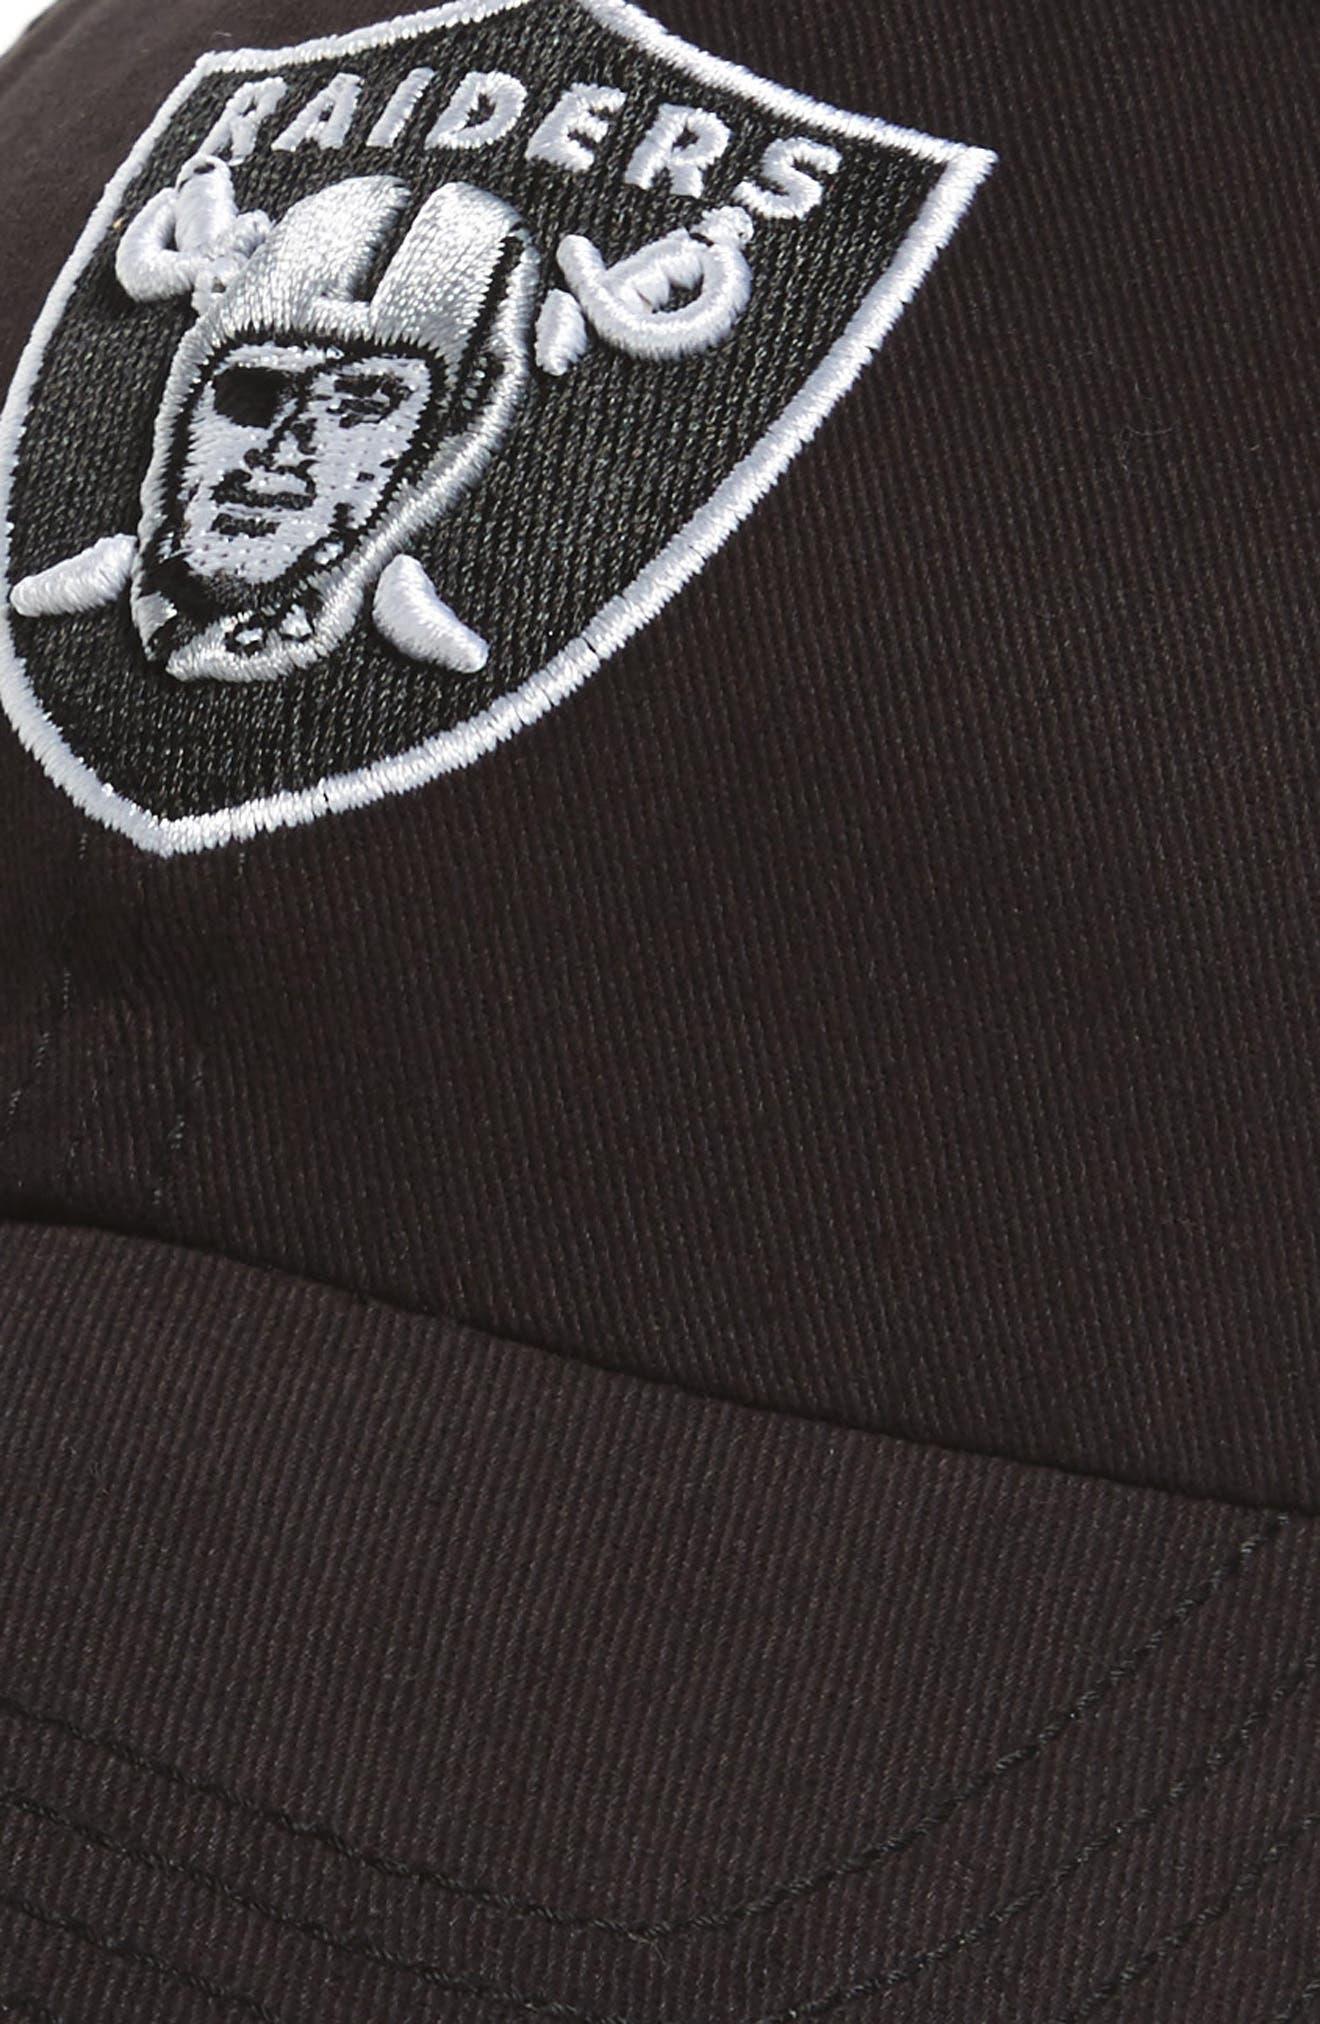 Alternate Image 3  - '47 Miata Clean Up Oakland Raiders Ball Cap